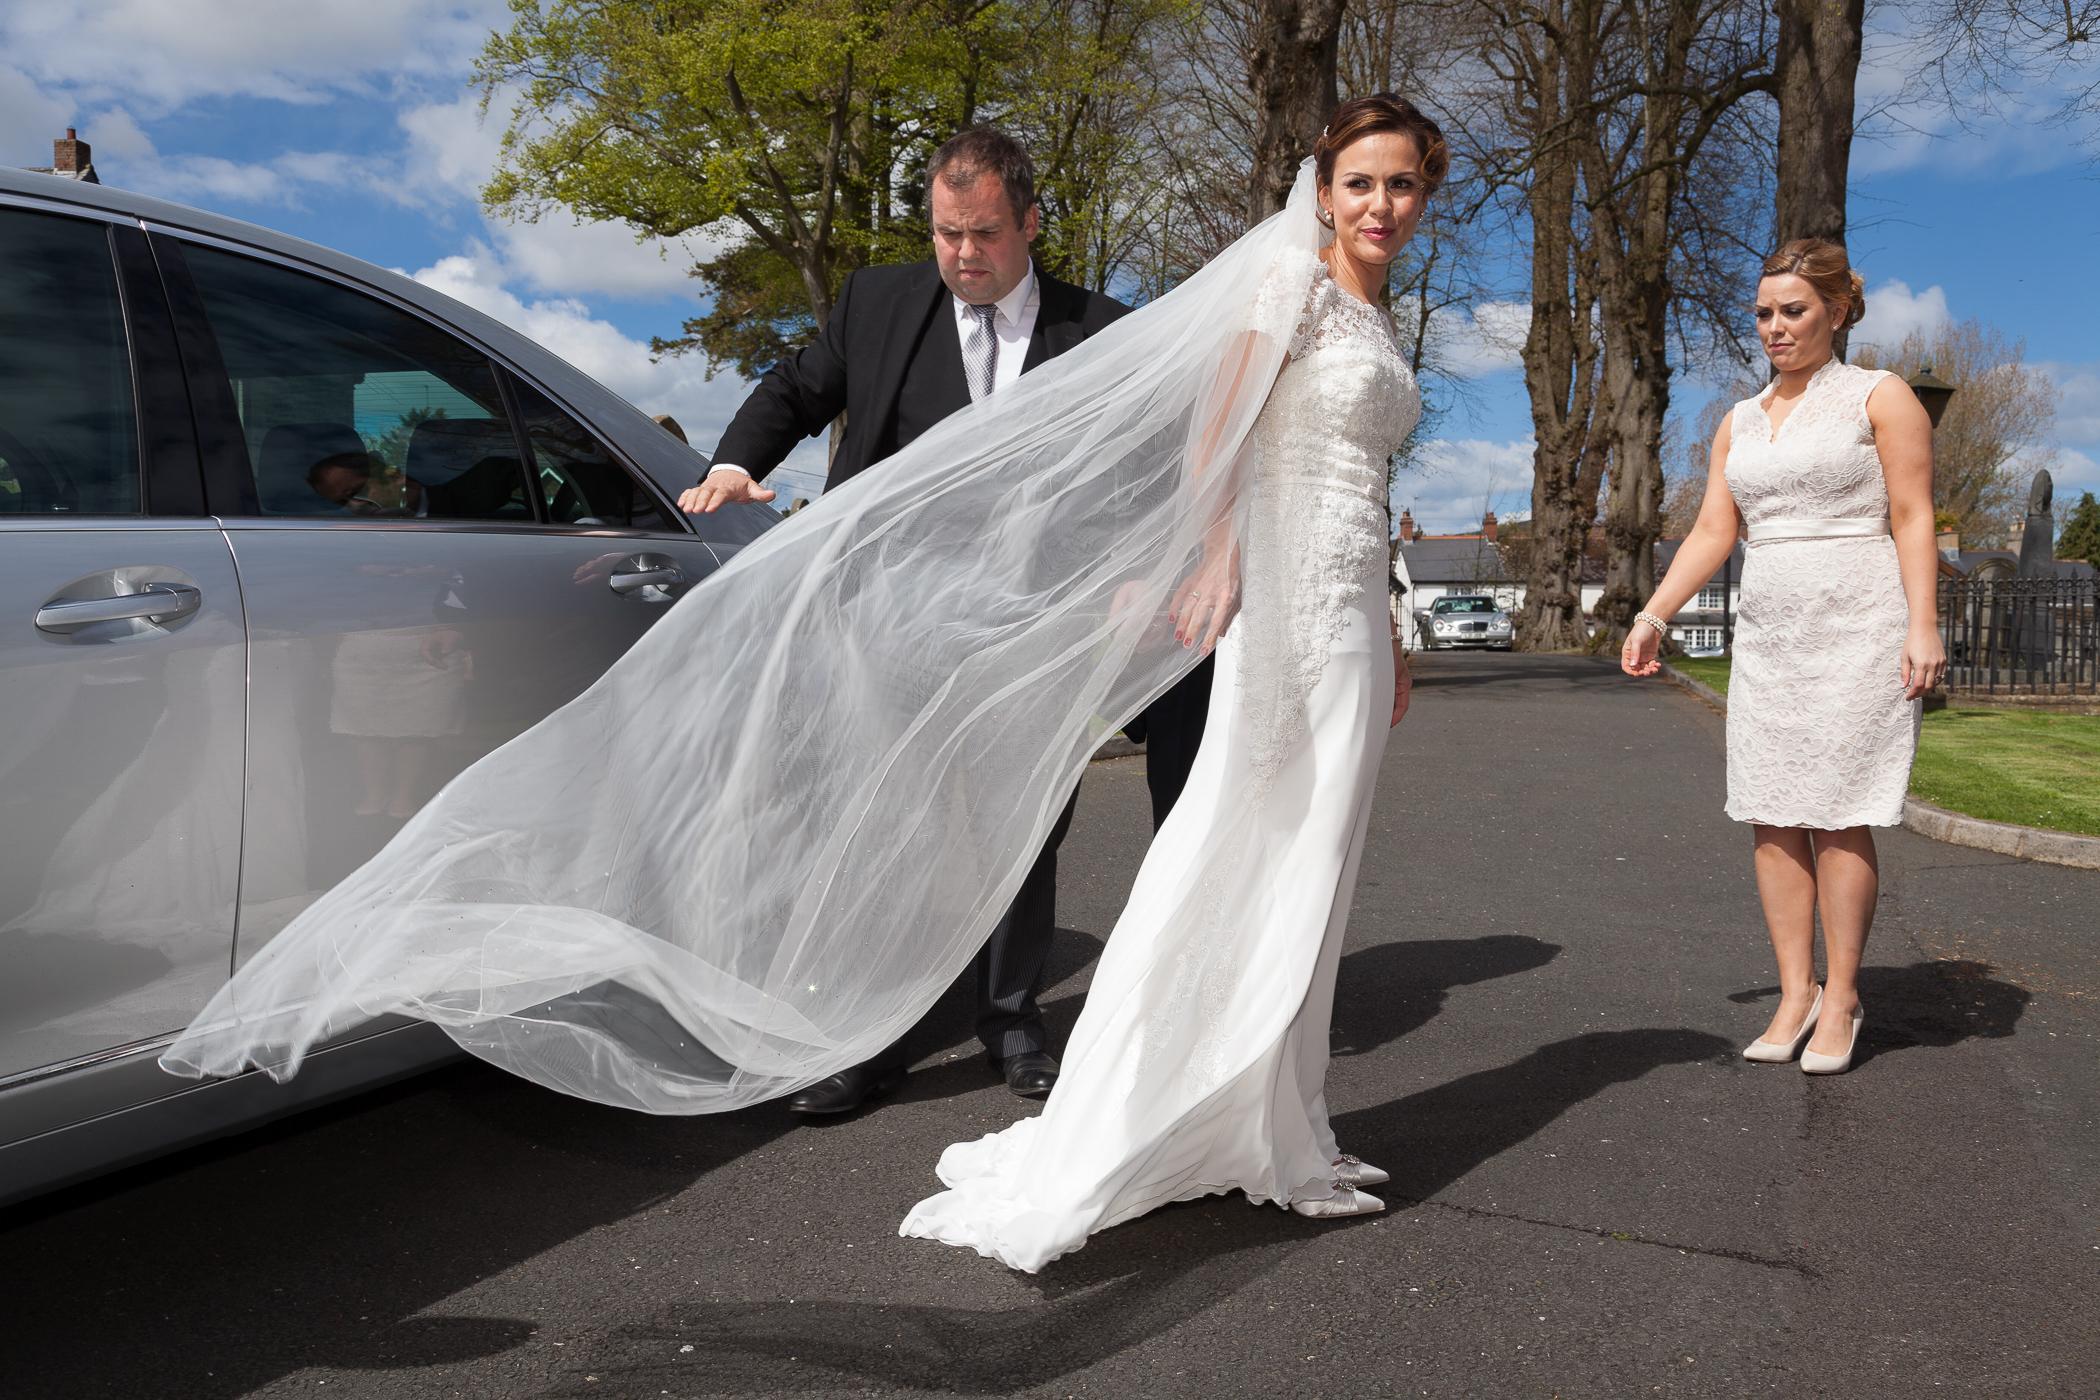 Castle Leslie Wedding - Suzie and Aaron